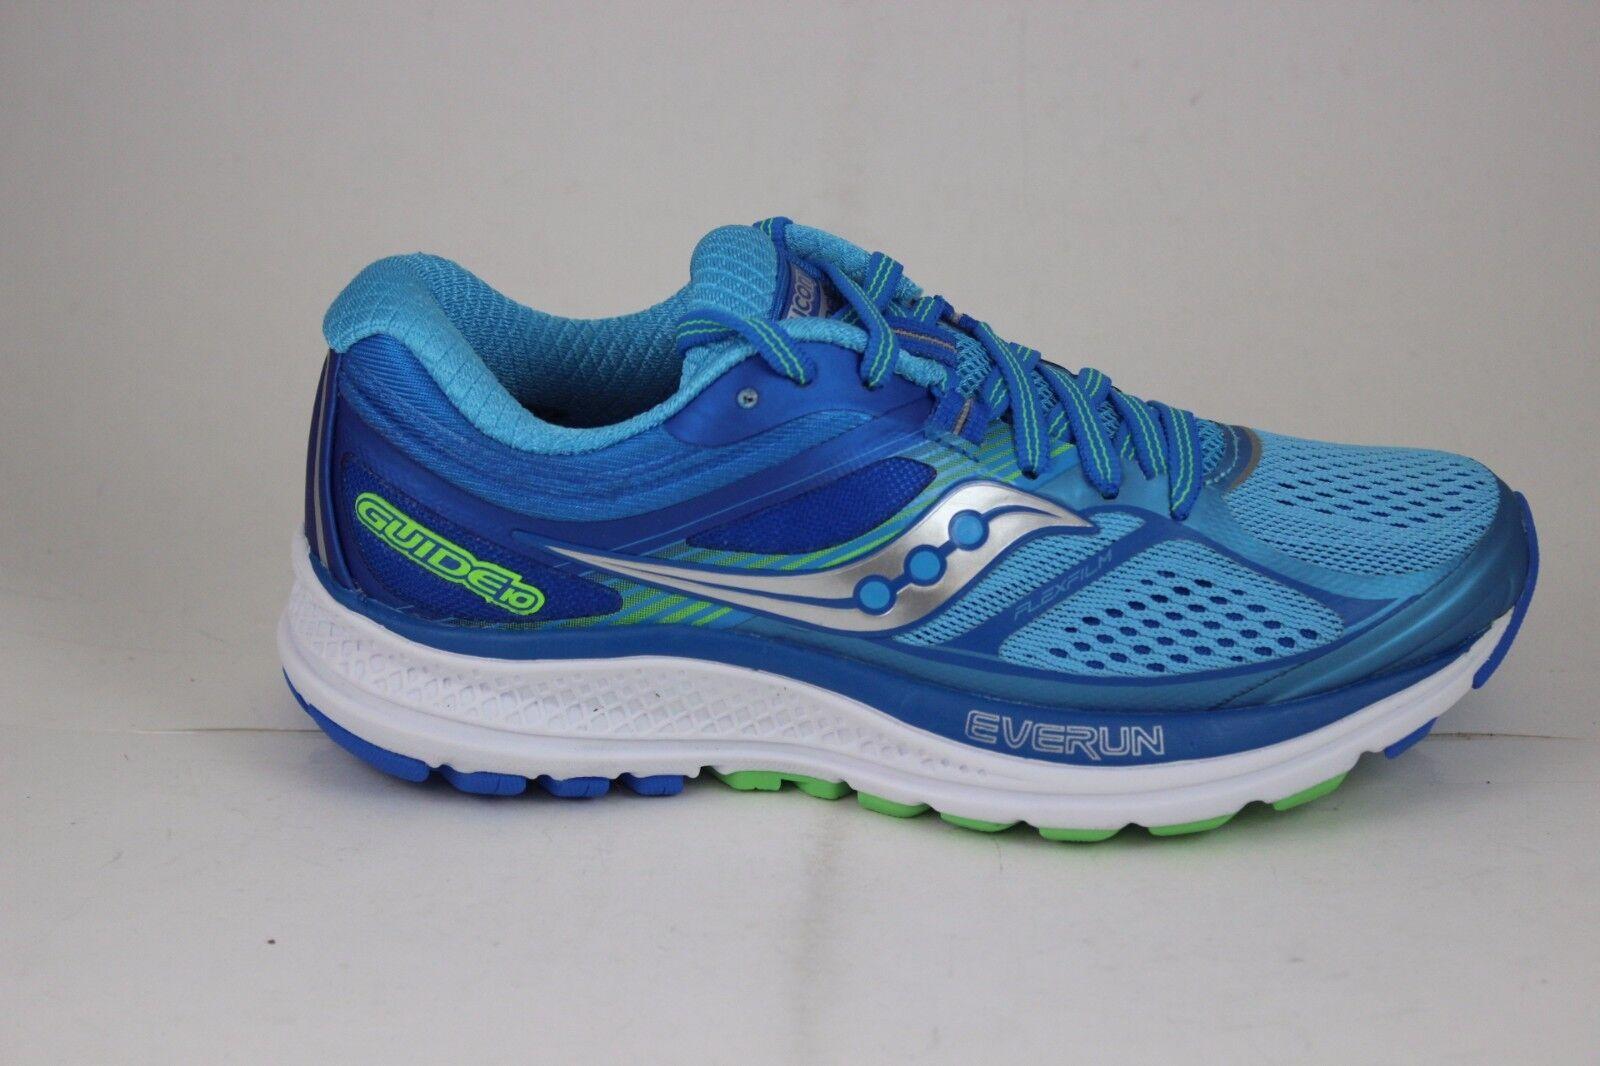 39c80466795b Saucony S10351-1 Guide 10 Light Blue  Blue Women Running Shoes Size ...